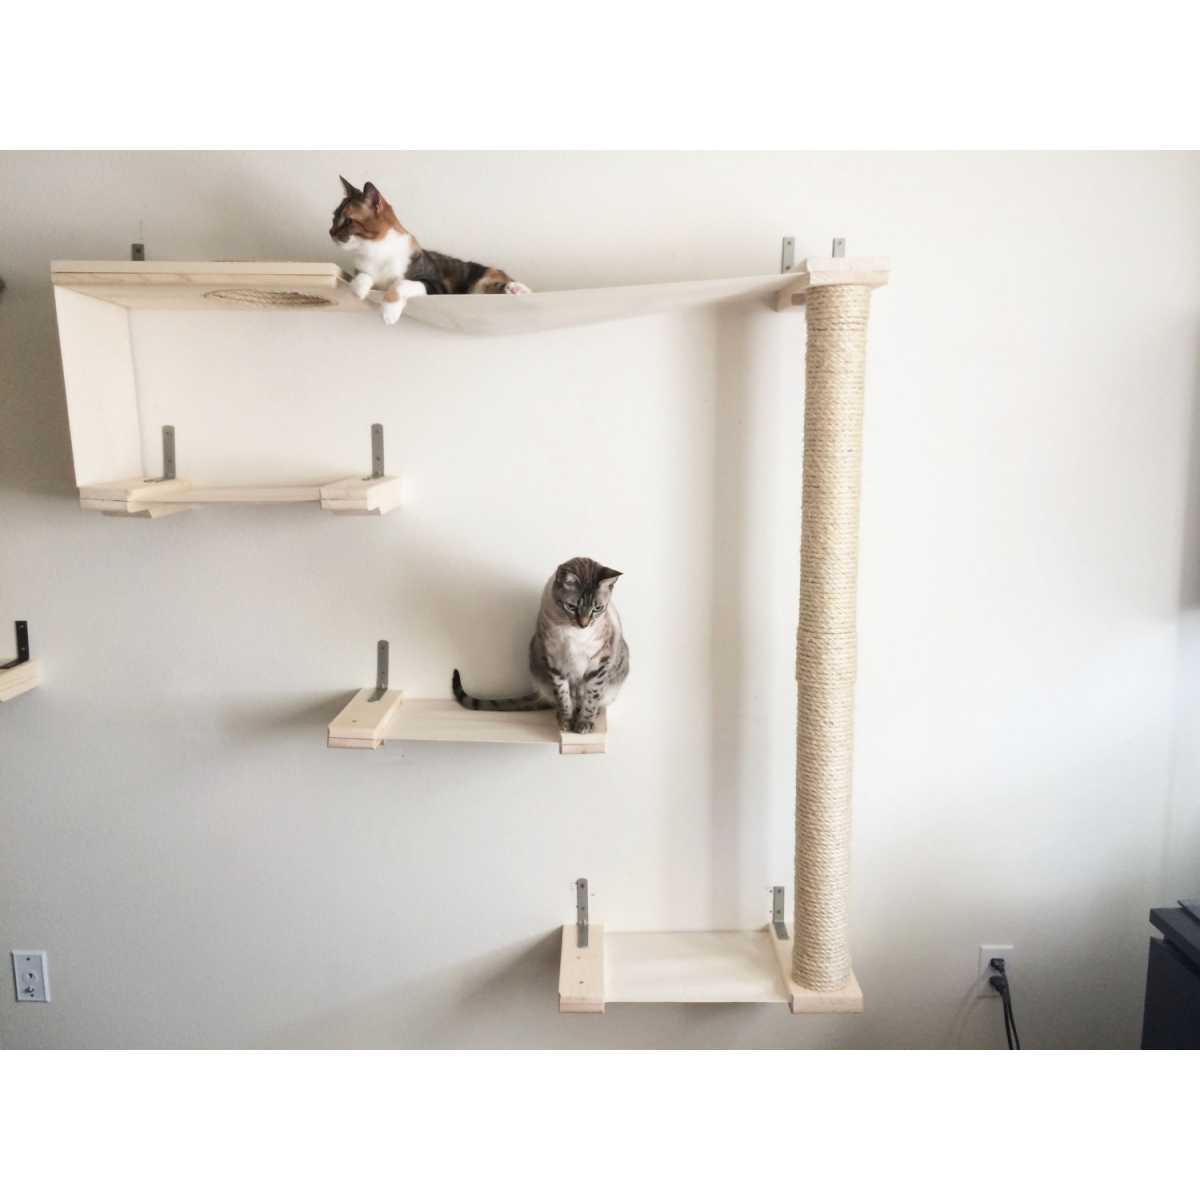 Catastrophicreations Cat Sky Track Catsplay Superstore